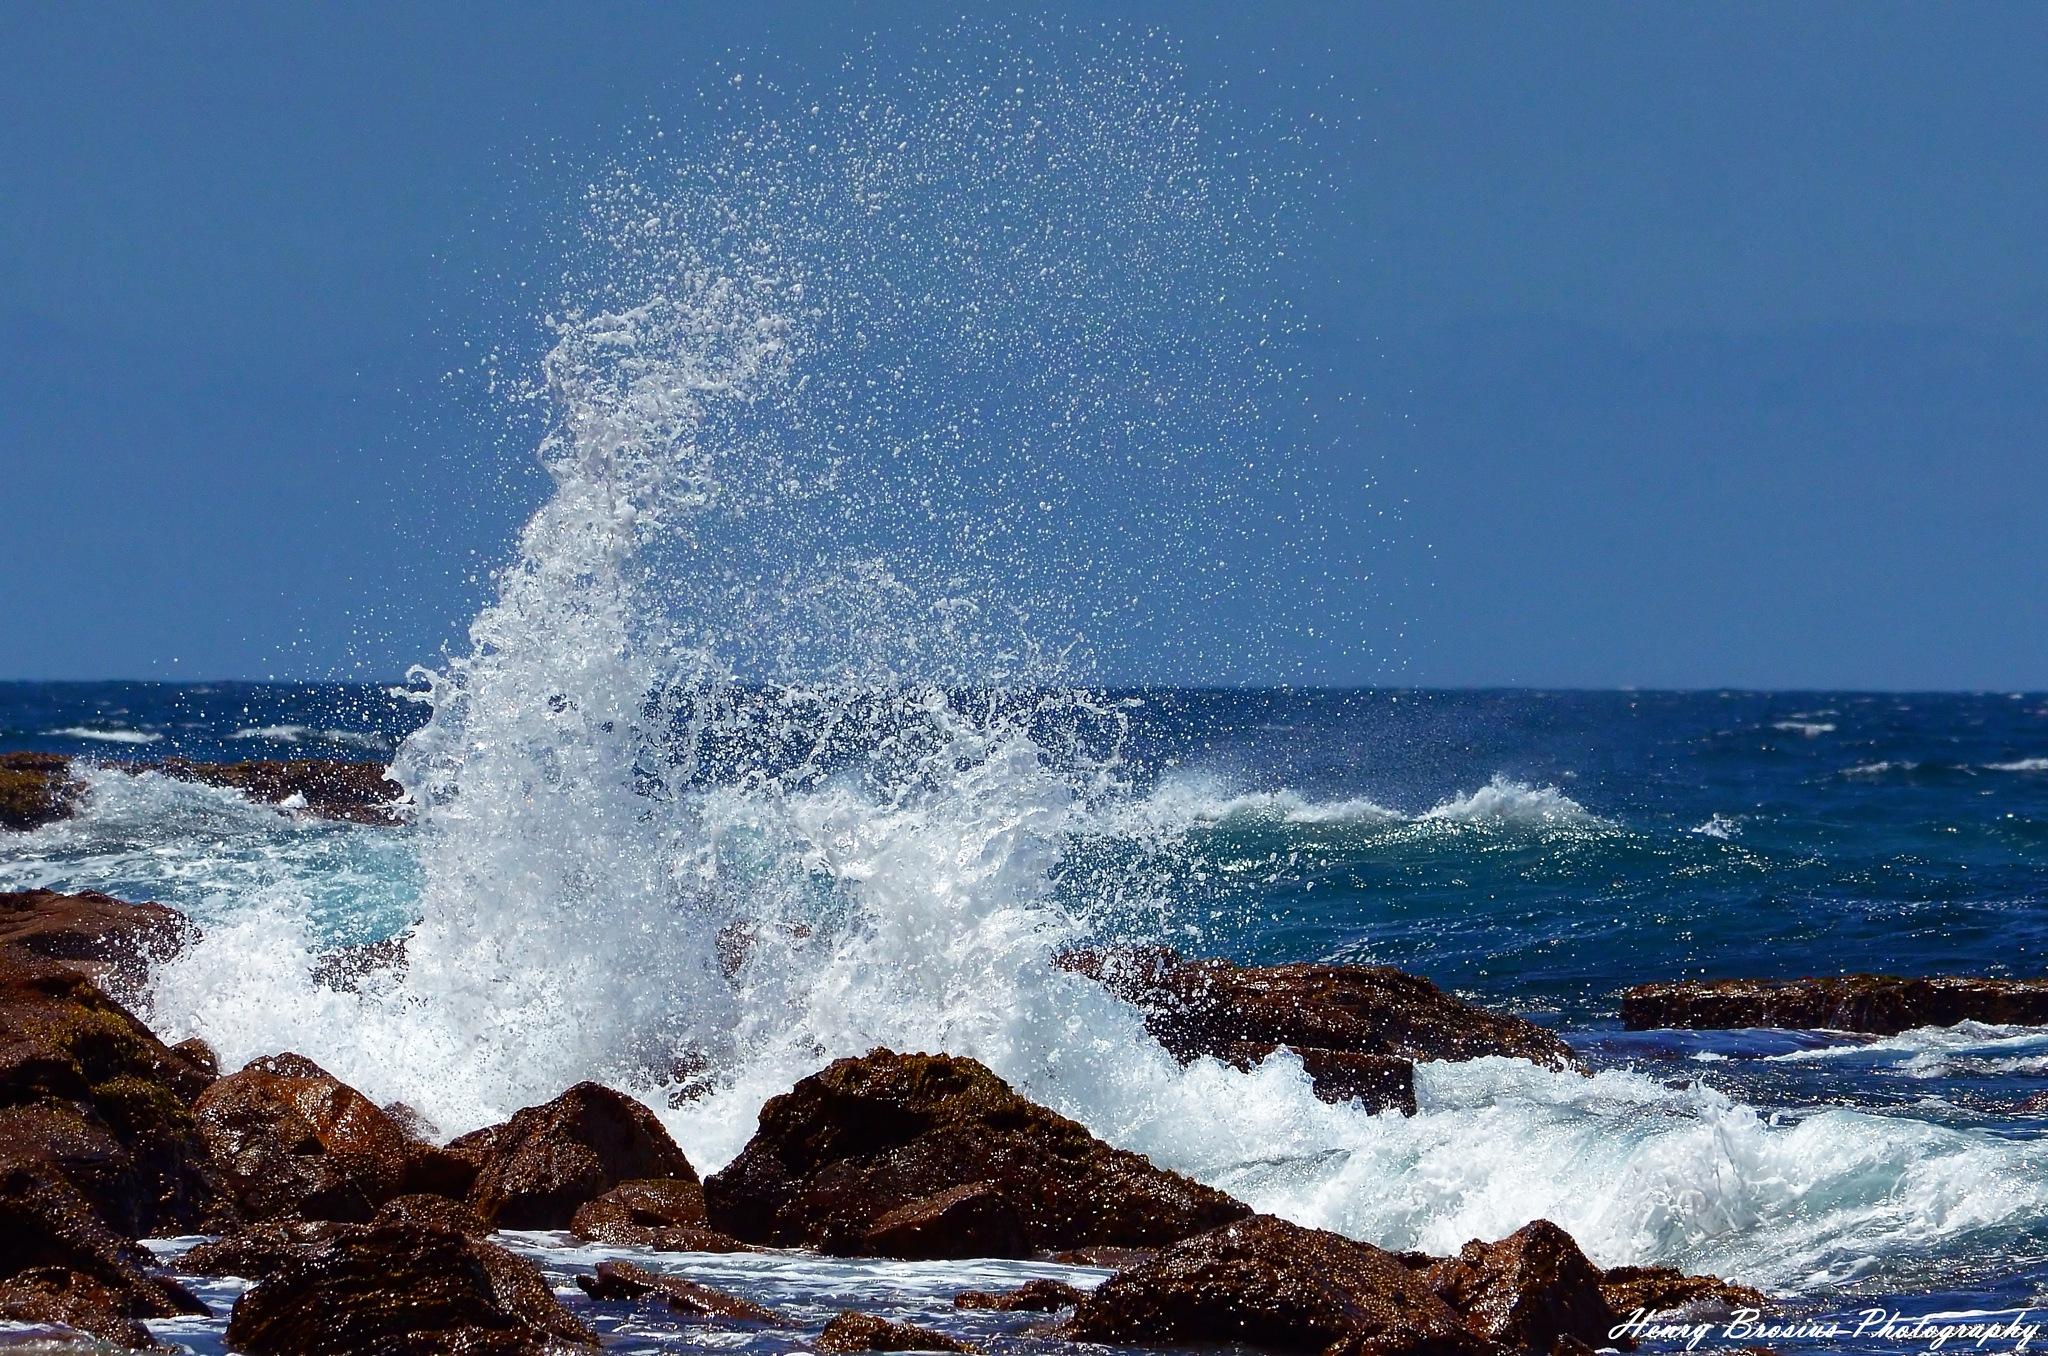 Crashing Surf by Henry Brosius